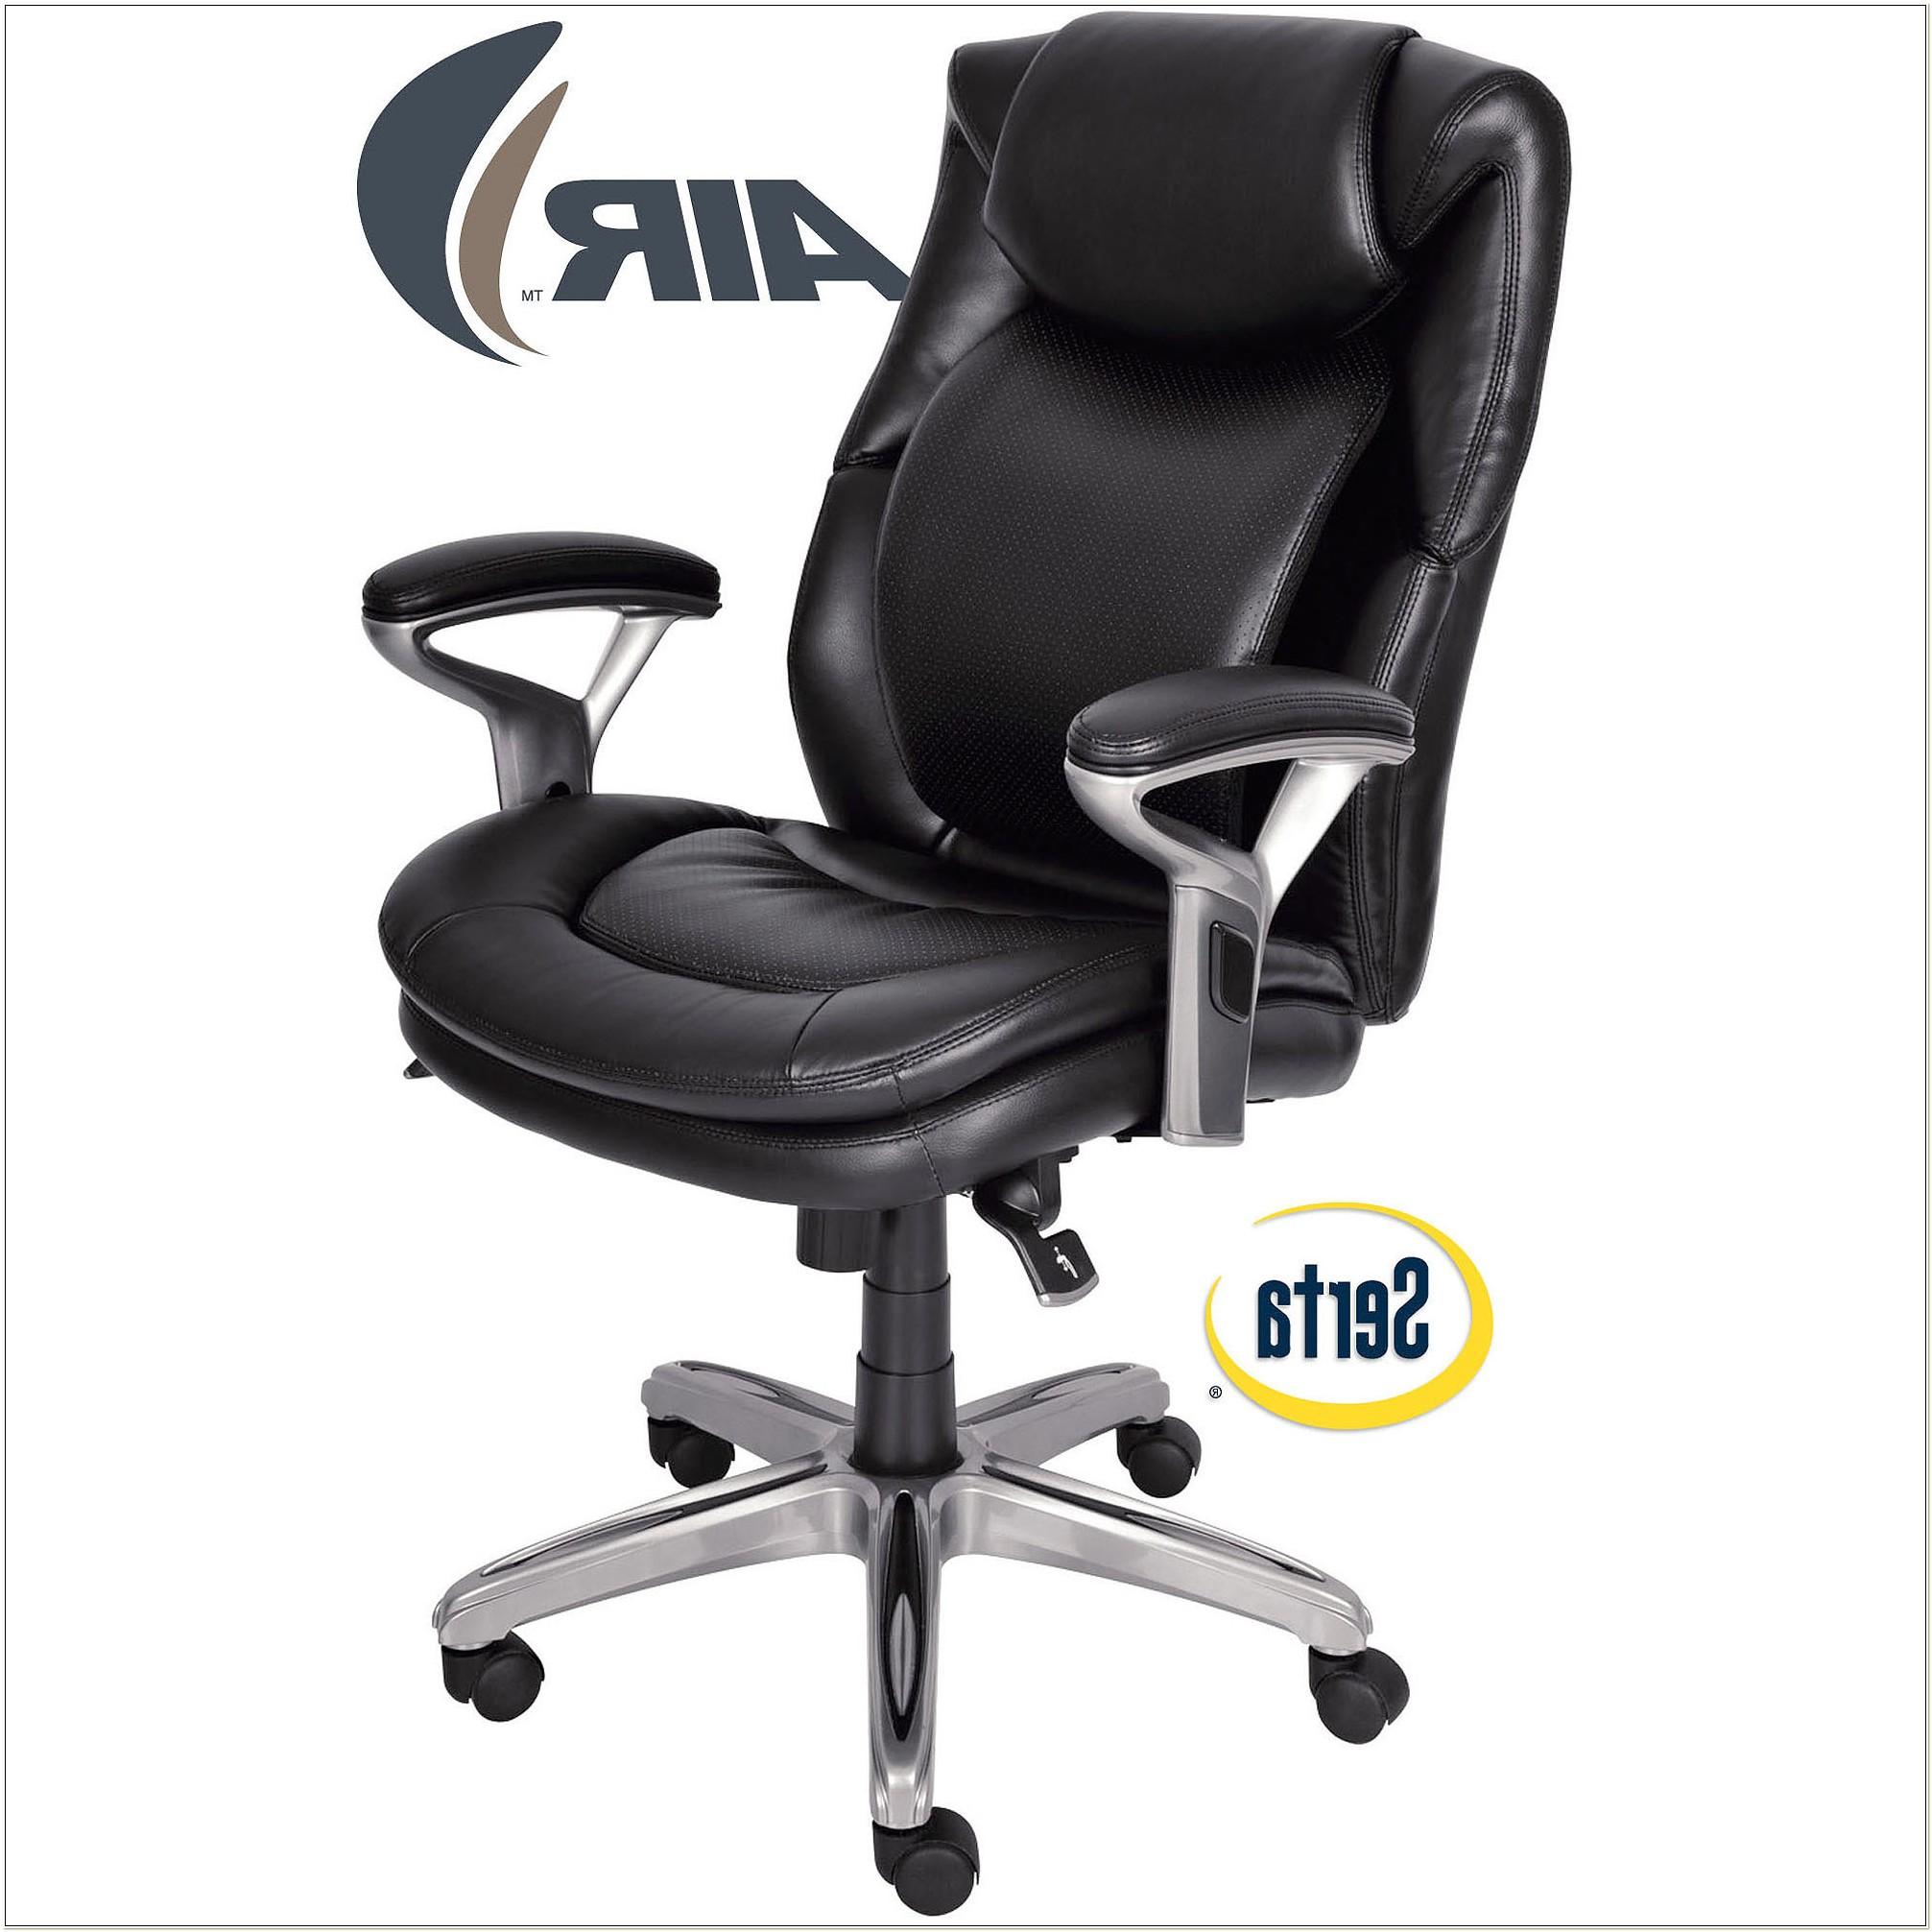 Serta Leather Desk Chair